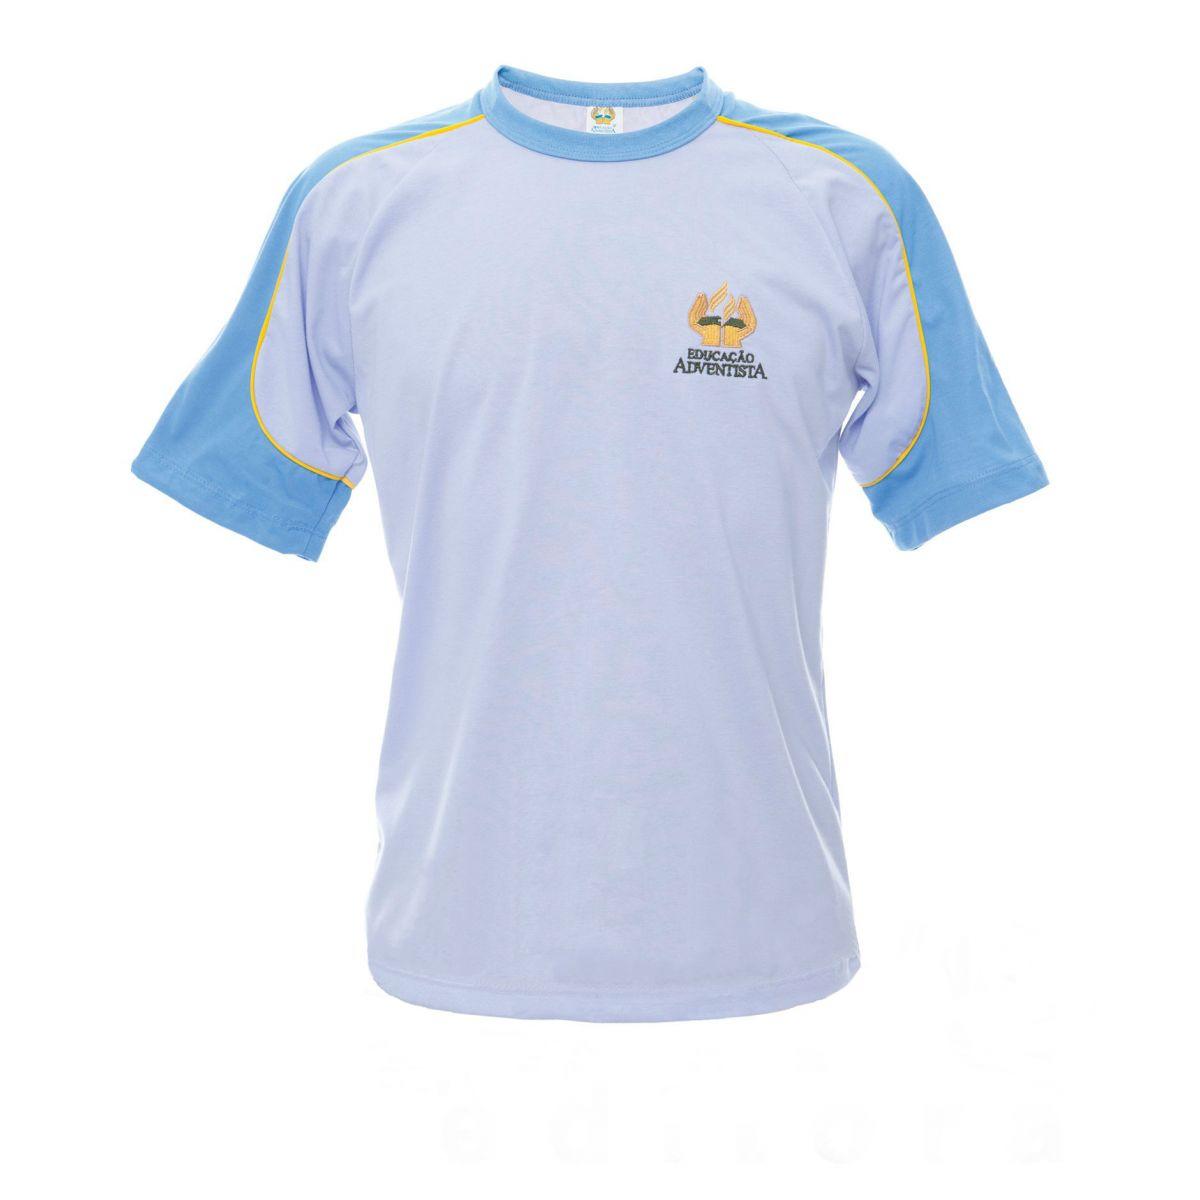 Camiseta Manga Curta - 4G